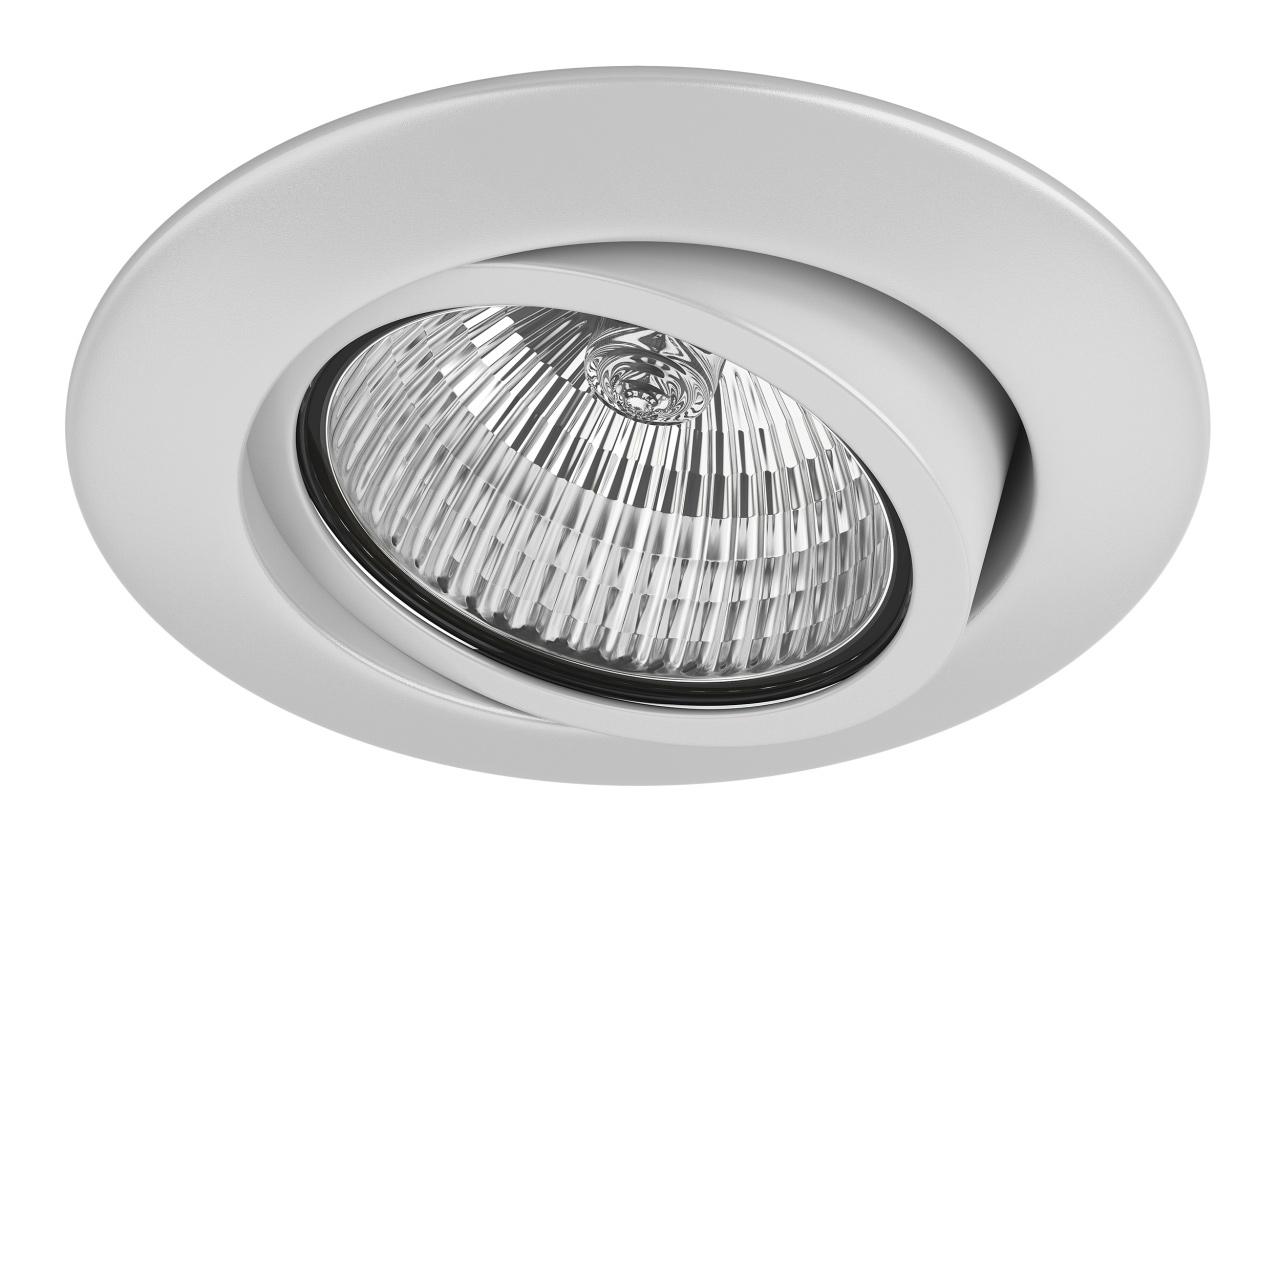 Светильник Teso ADJ MR16 / HP16 белый Lightstar 011080